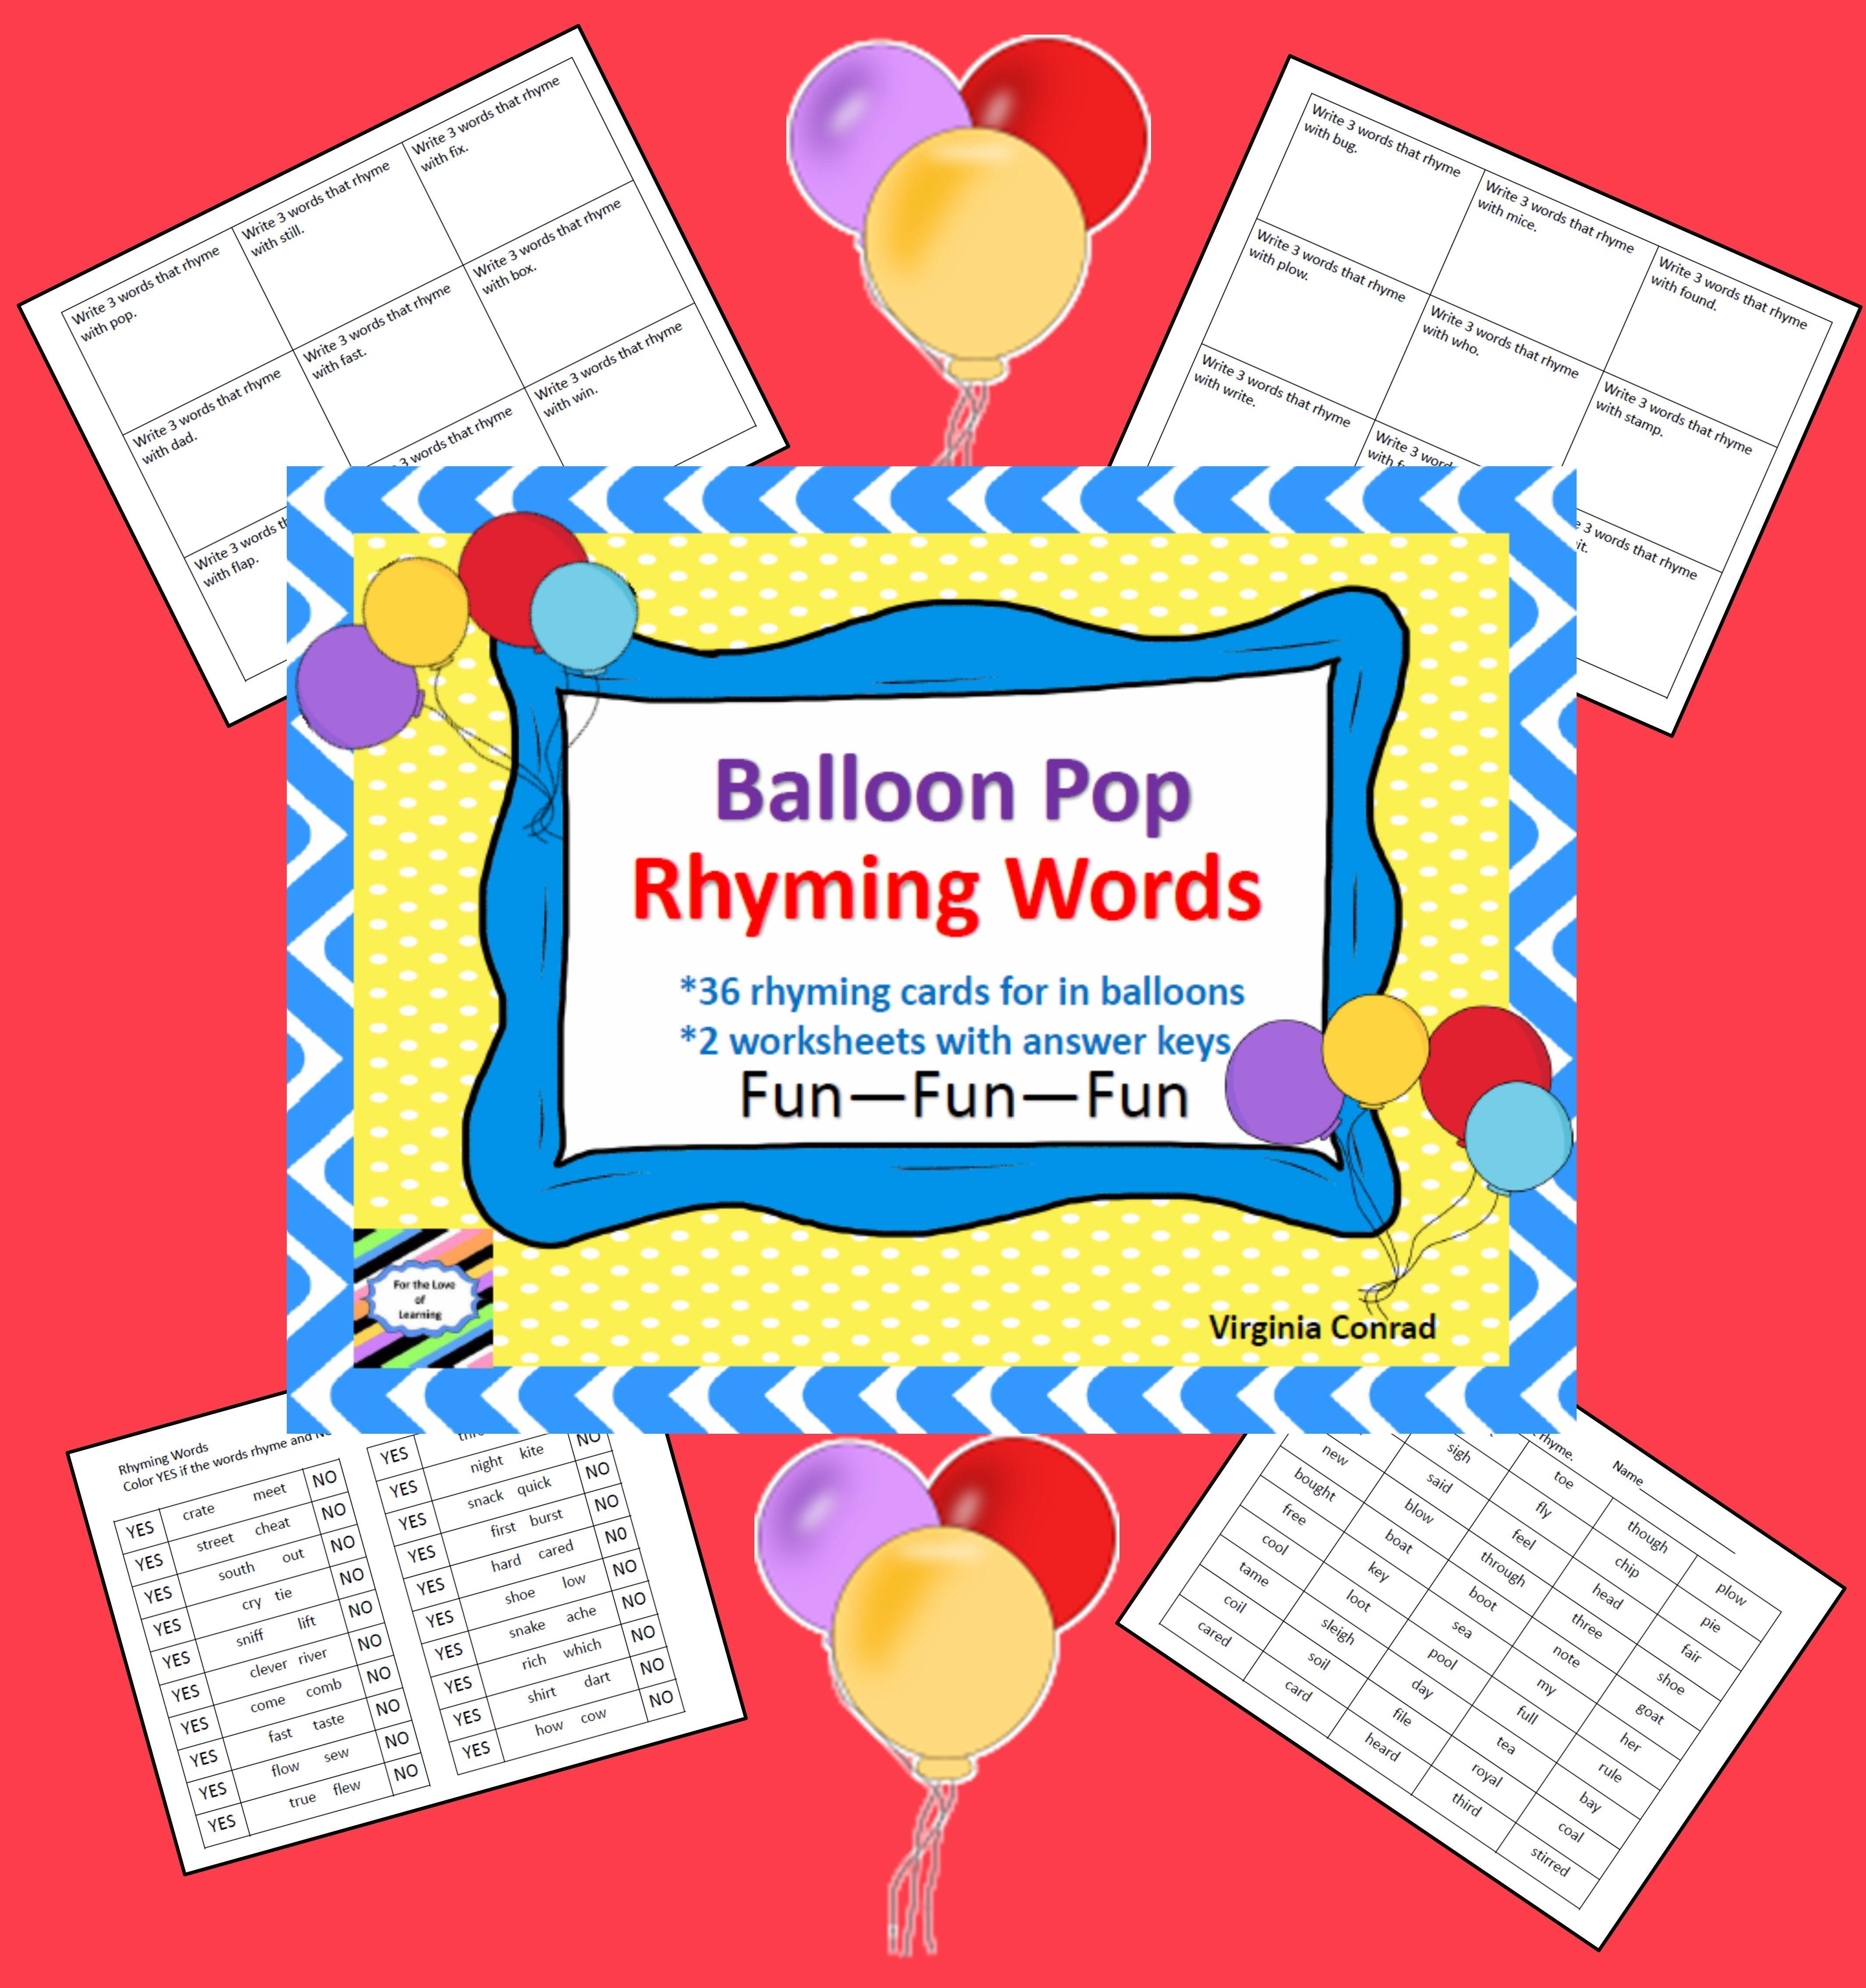 Rhyming Words Balloon Pop